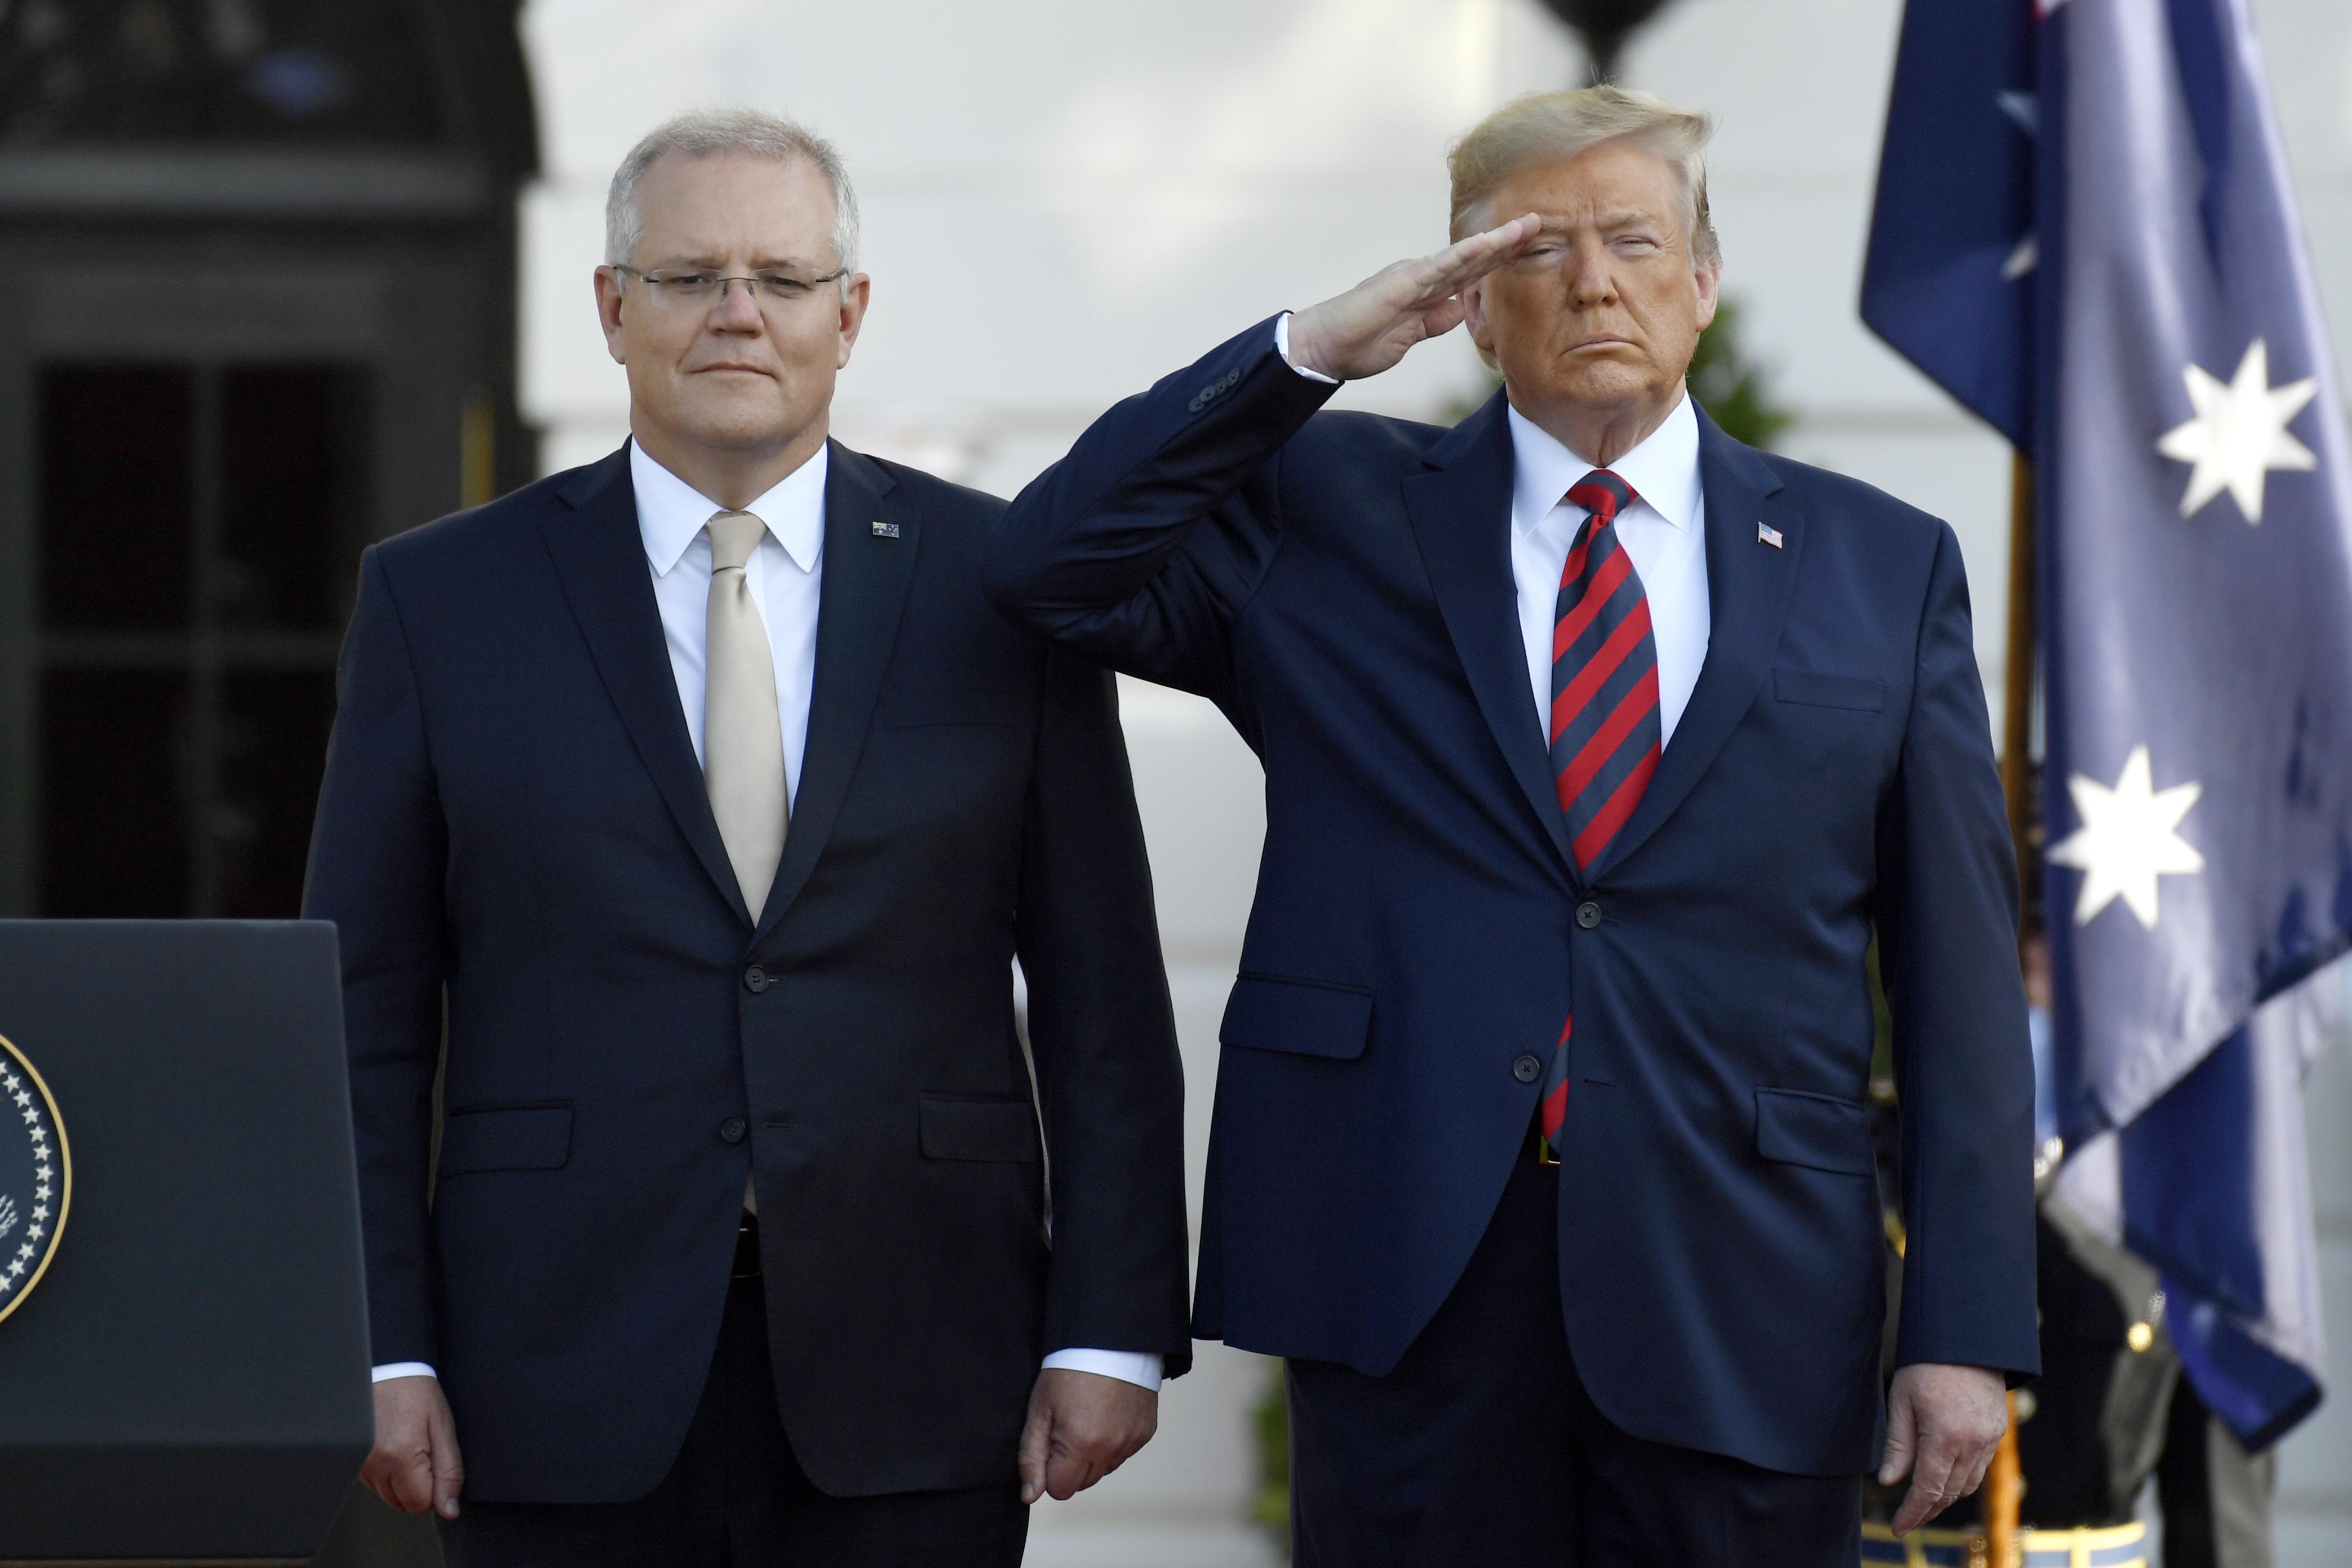 Donald Trump welcomes Scott Morrison, Australian prime minister, for official state visit